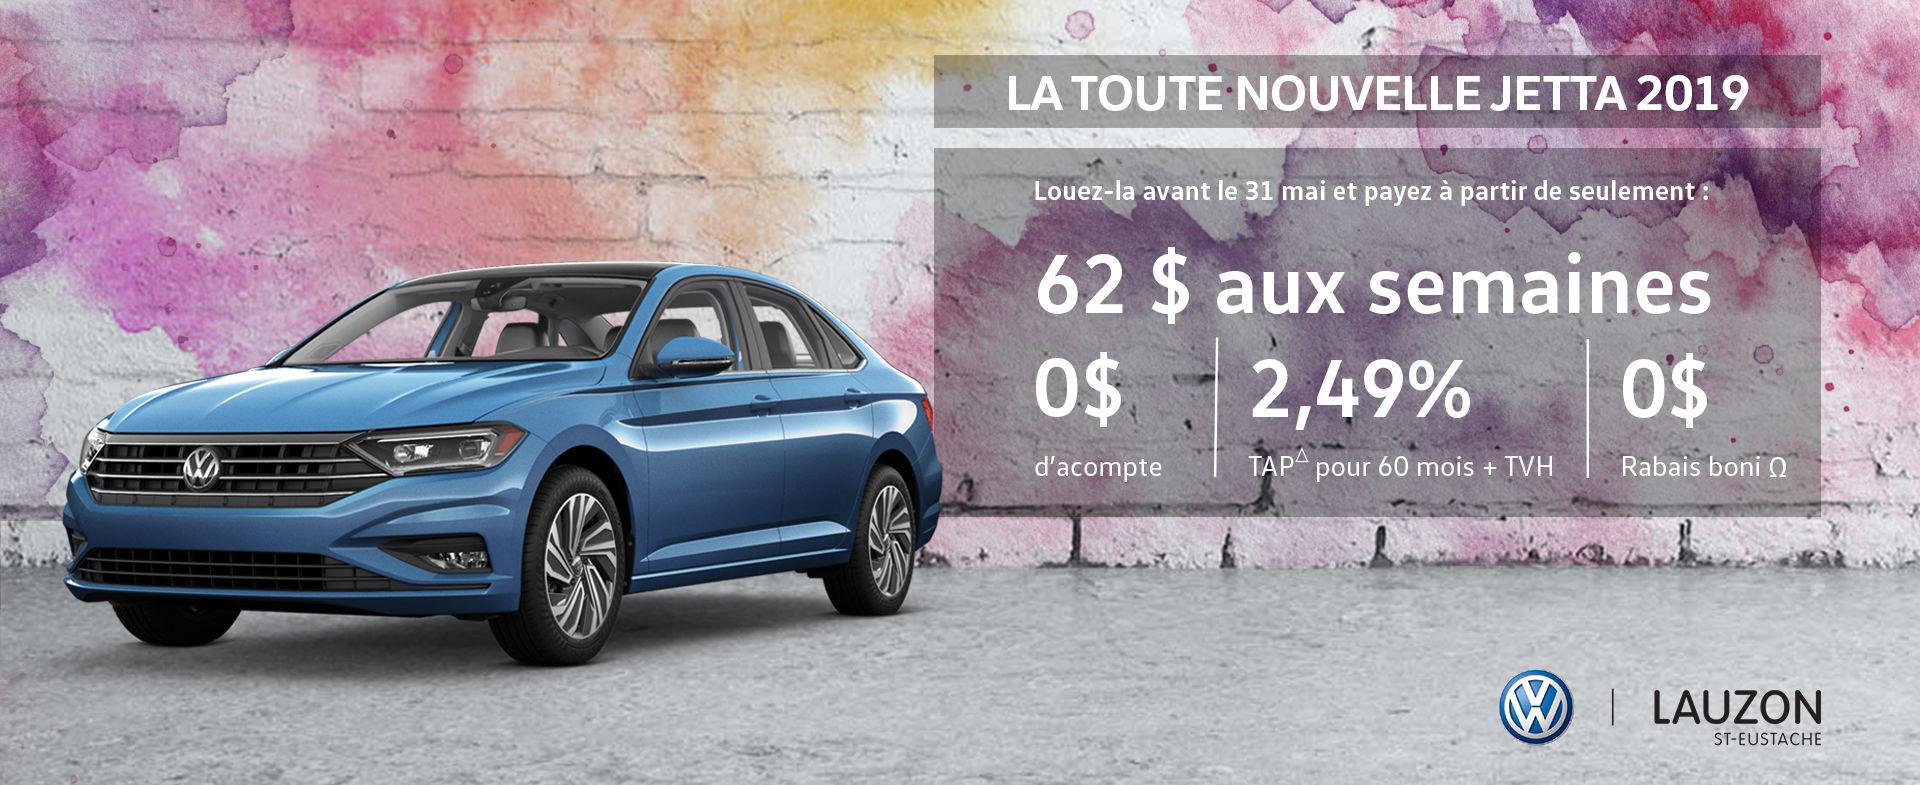 Promotion mai 2018 Volkswagen Jetta 2019 VW Lauzon St-Eustache